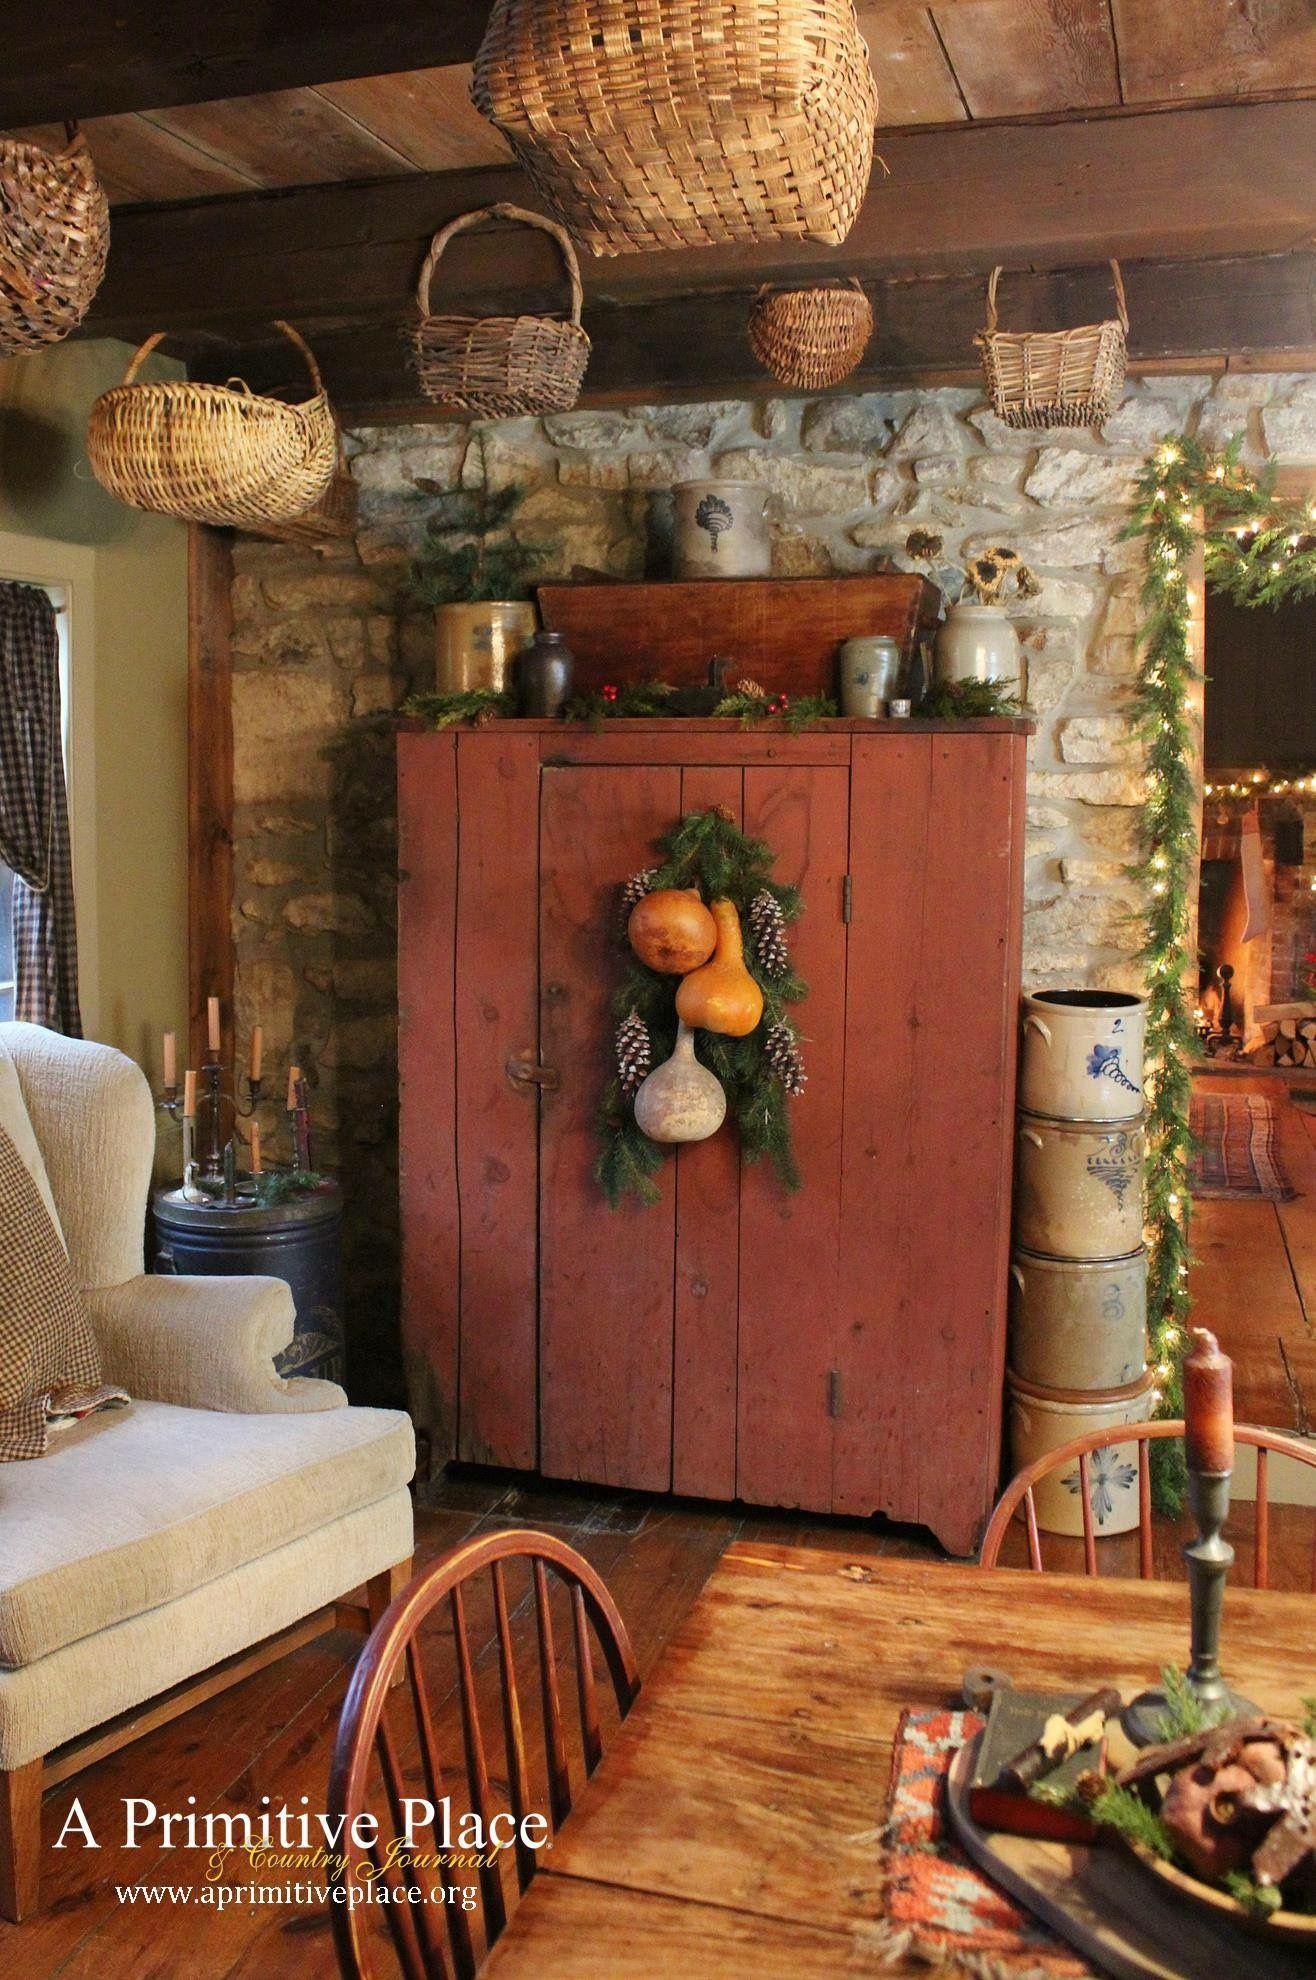 Pin de bonnie smith en Primitives | Pinterest | Cocinas rústicas ...